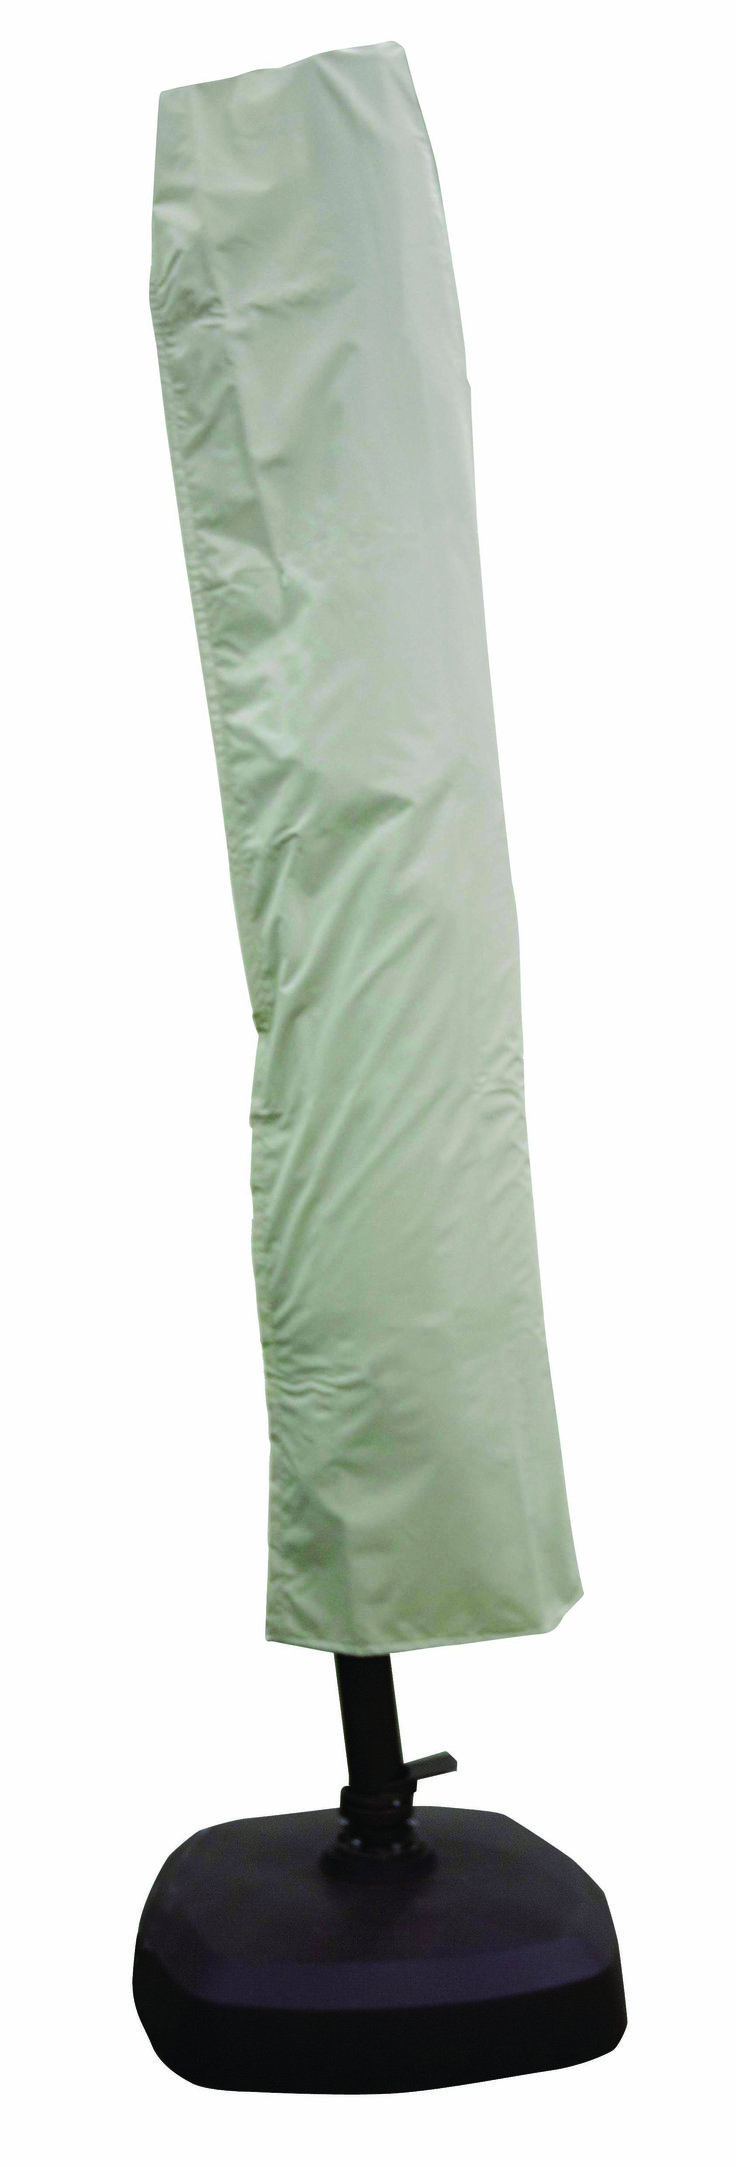 Umbrella covers for patio umbrellas - Offset Umbrellas Huge Discounts On Offset Patio Umbrellas Cantilever Umbrella Sale At Factorydirectpatioumbrellas Com